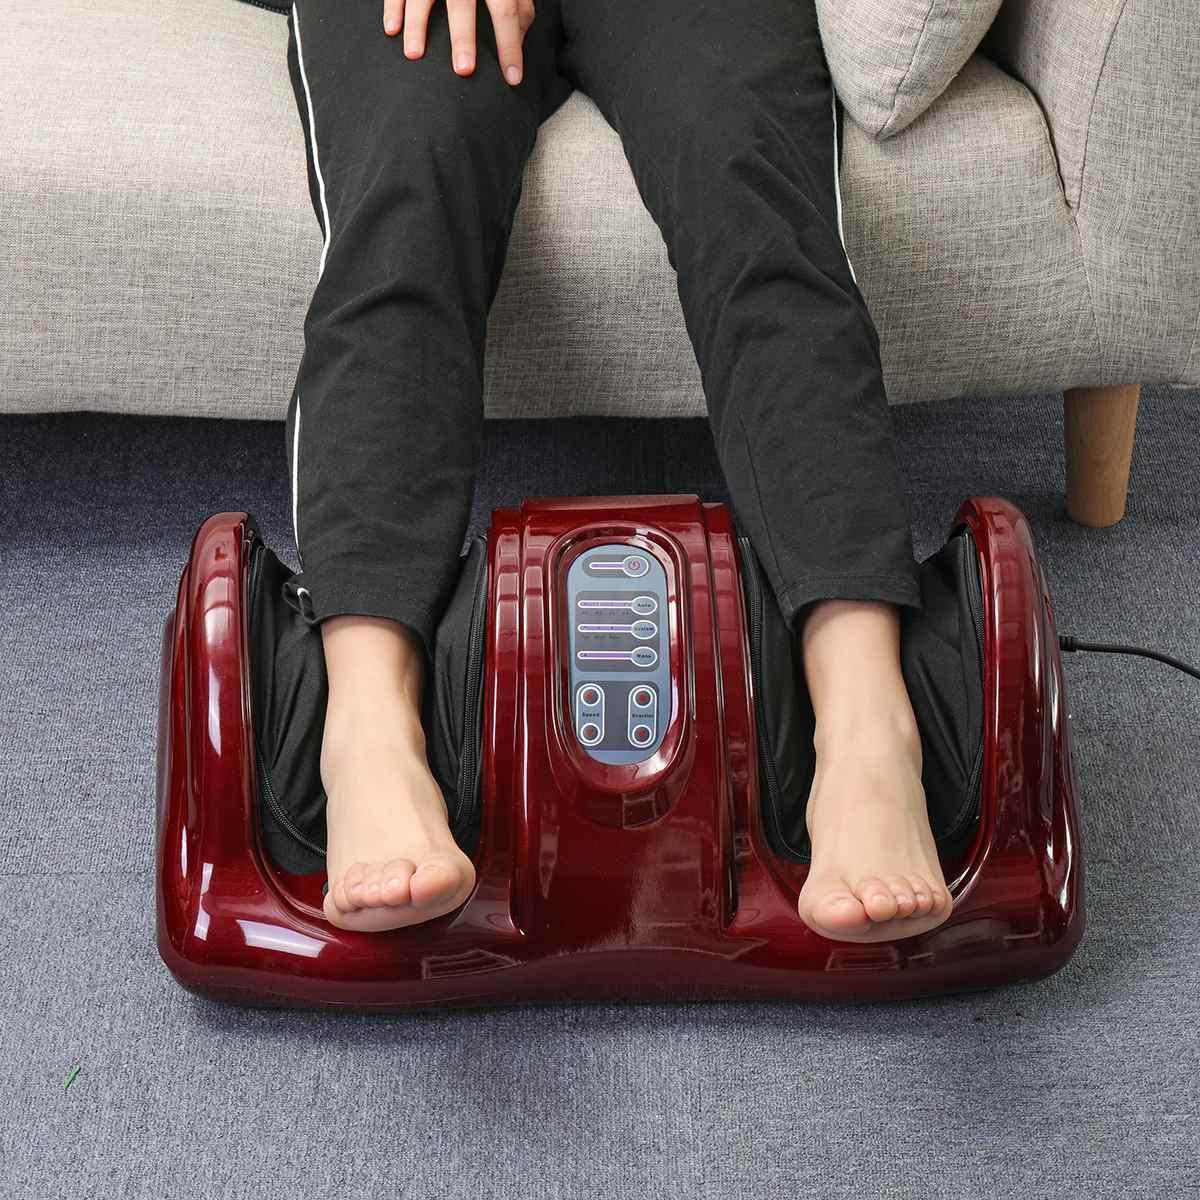 220V Foot Massager Electric Heating Foot Body Leg Massager Shiatsu Kneading Roller Vibrator Machine Reflexology Calf Leg Relax enlarge